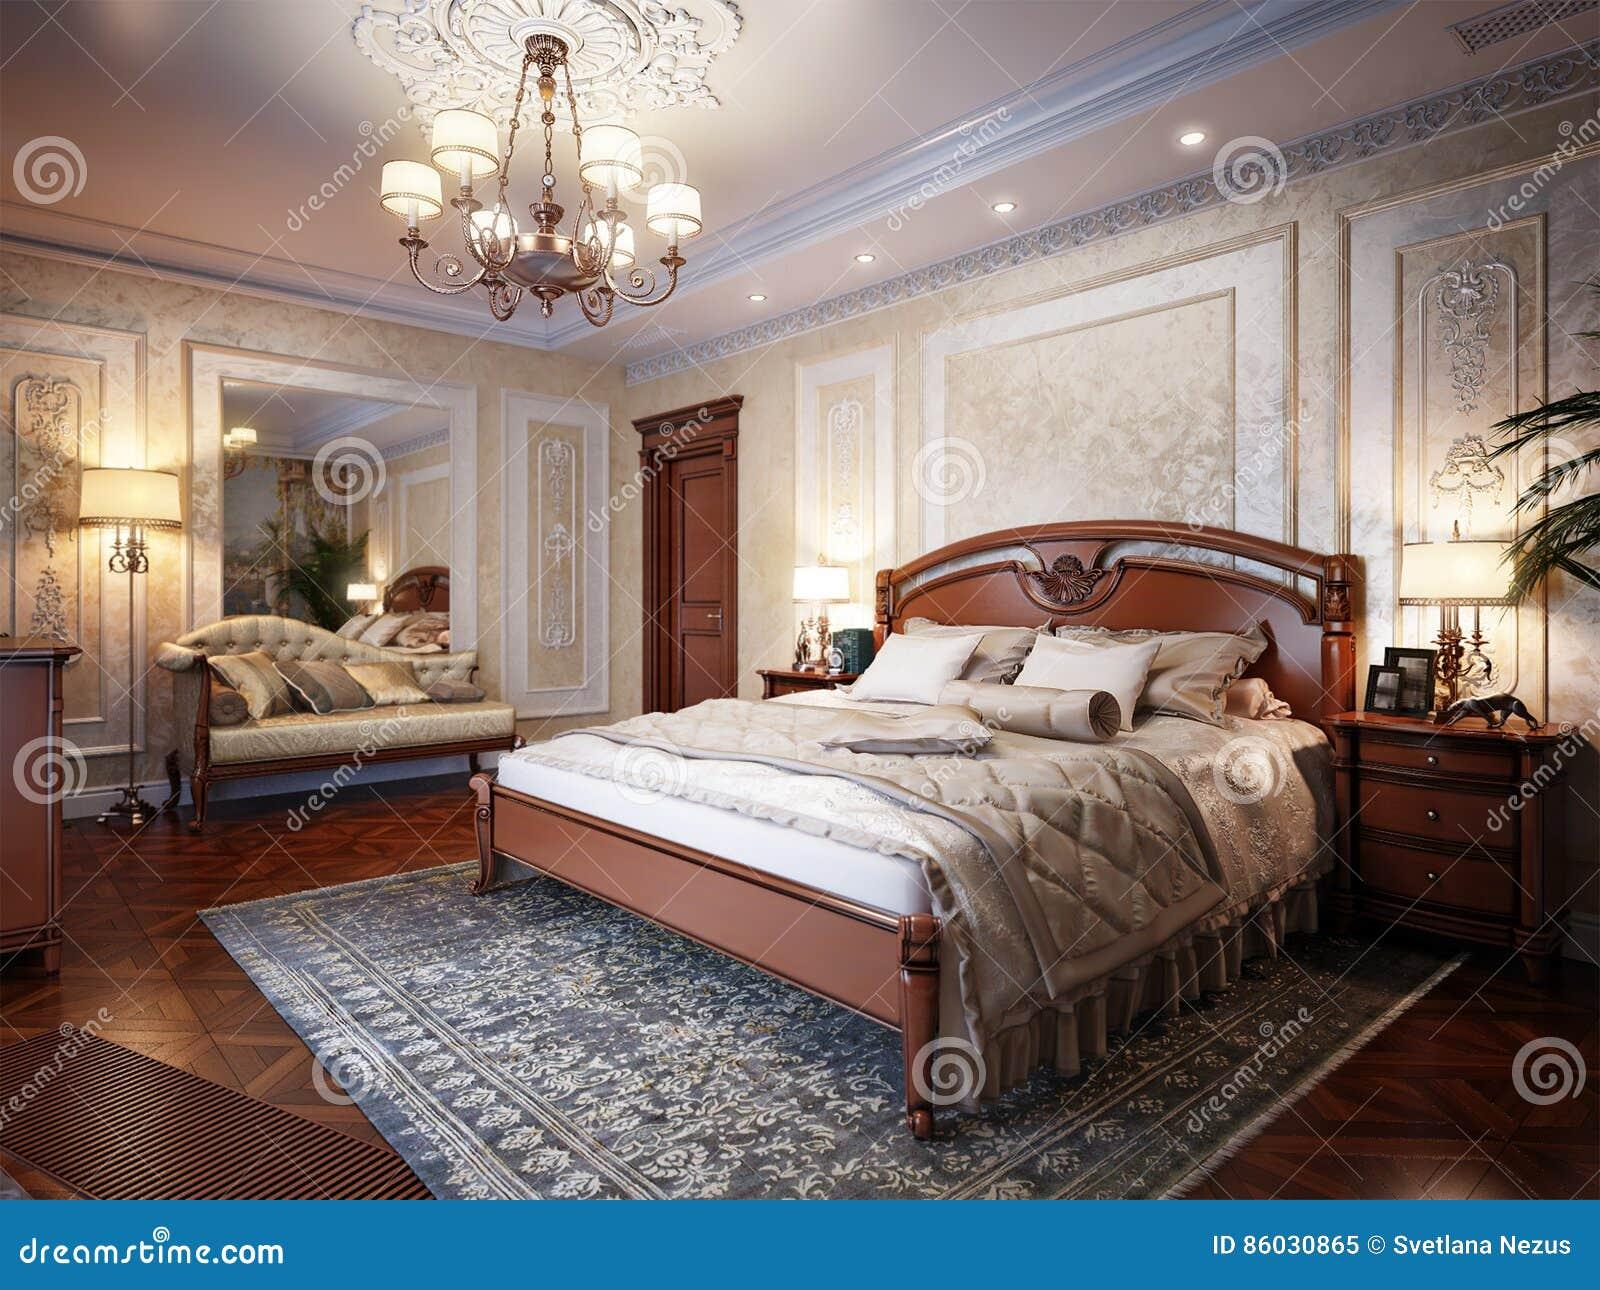 Luxury Classic Interior Design Bedroom Luxury bedroom interior design in classic style